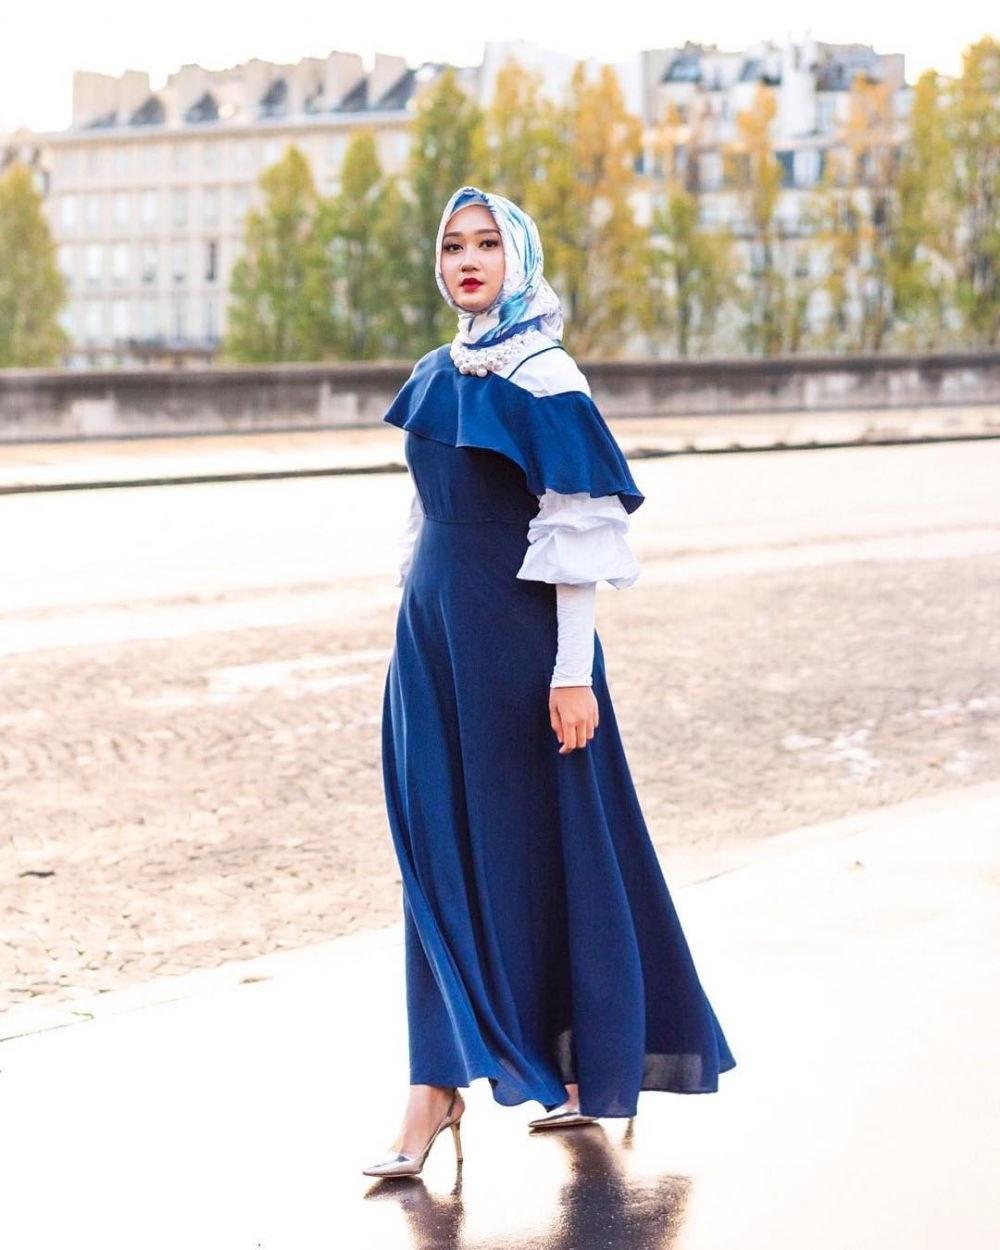 Ide Baju Lebaran Dian Pelangi Dwdk 10 Ide Outfit Lebaran Ala Dian Pelangi Bikin Amu Makin